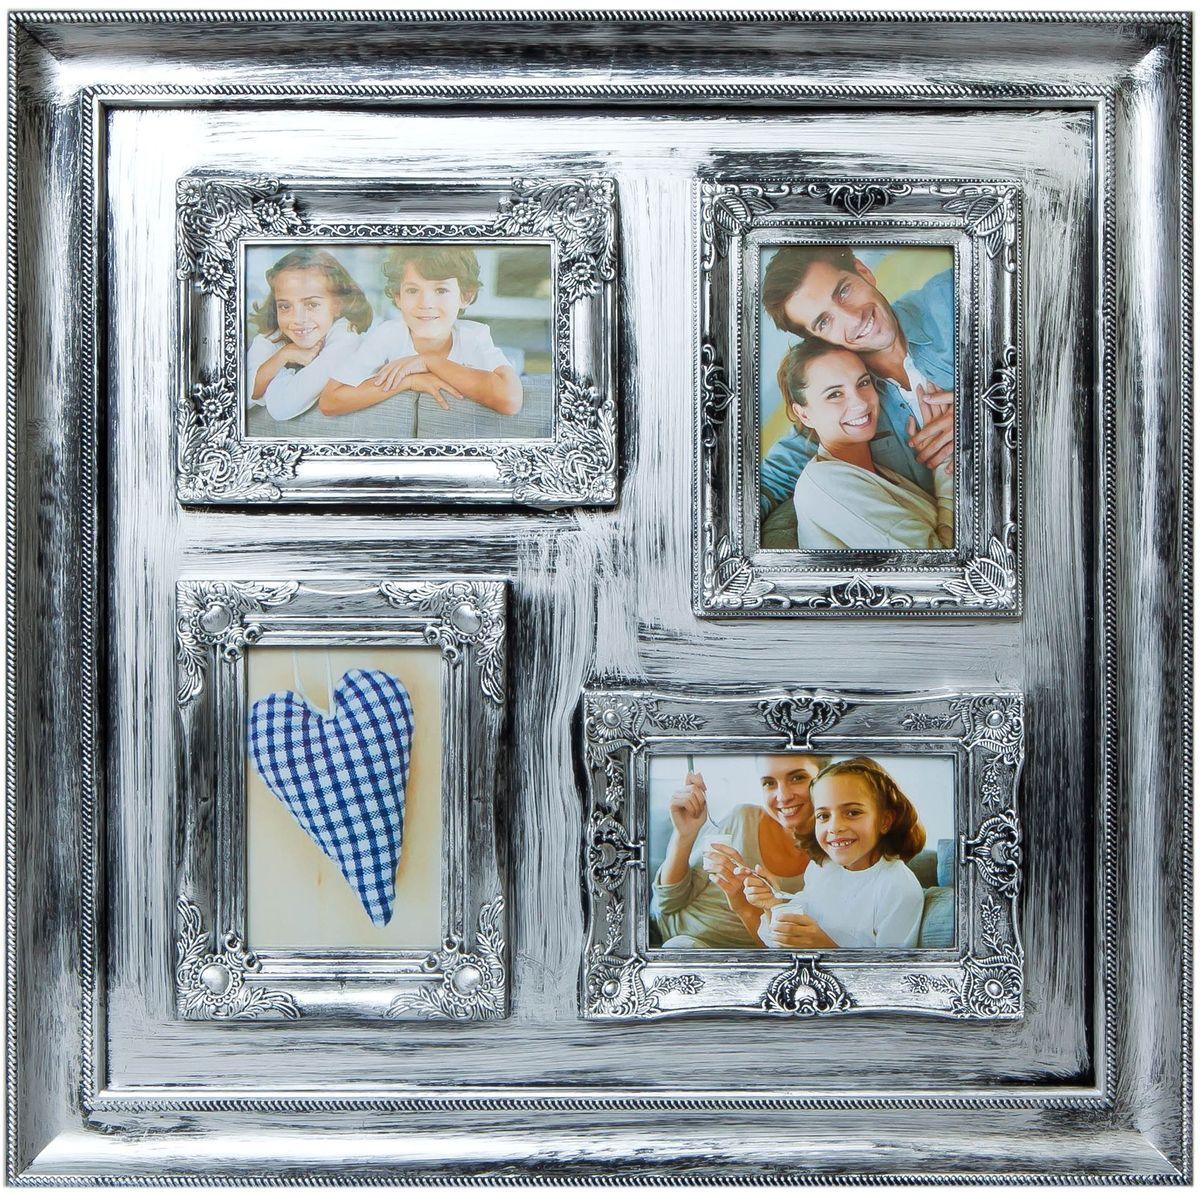 Фоторамка Platinum, цвет: серебристый, на 4 фото 10 х 15 см фоторамка птица 10 x 15 см 25808